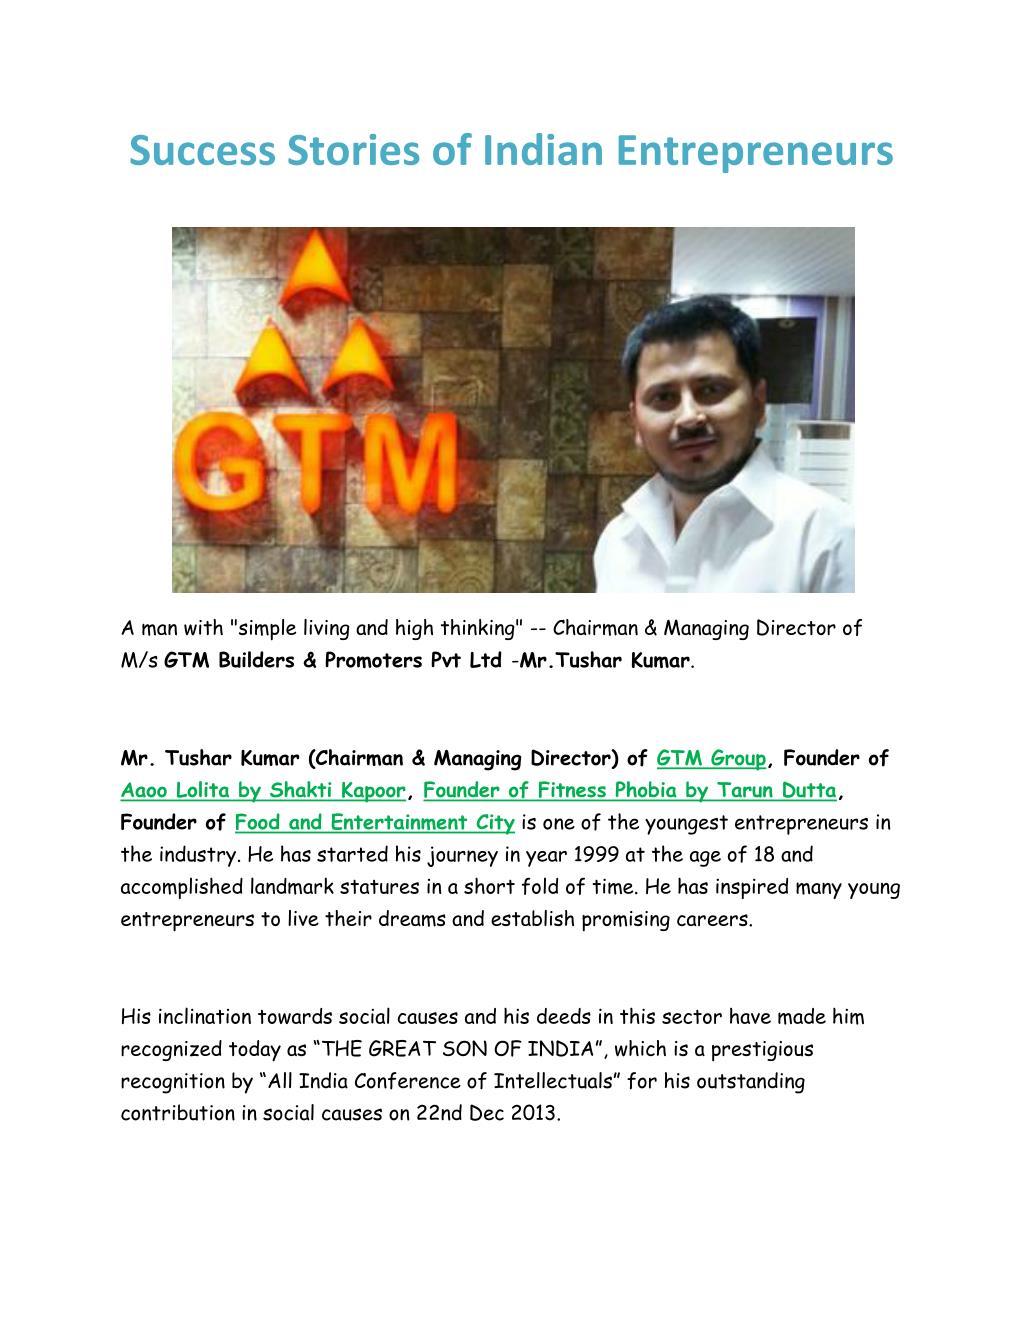 Inspiring success story of bhavish aggarwal the wild chronicles.